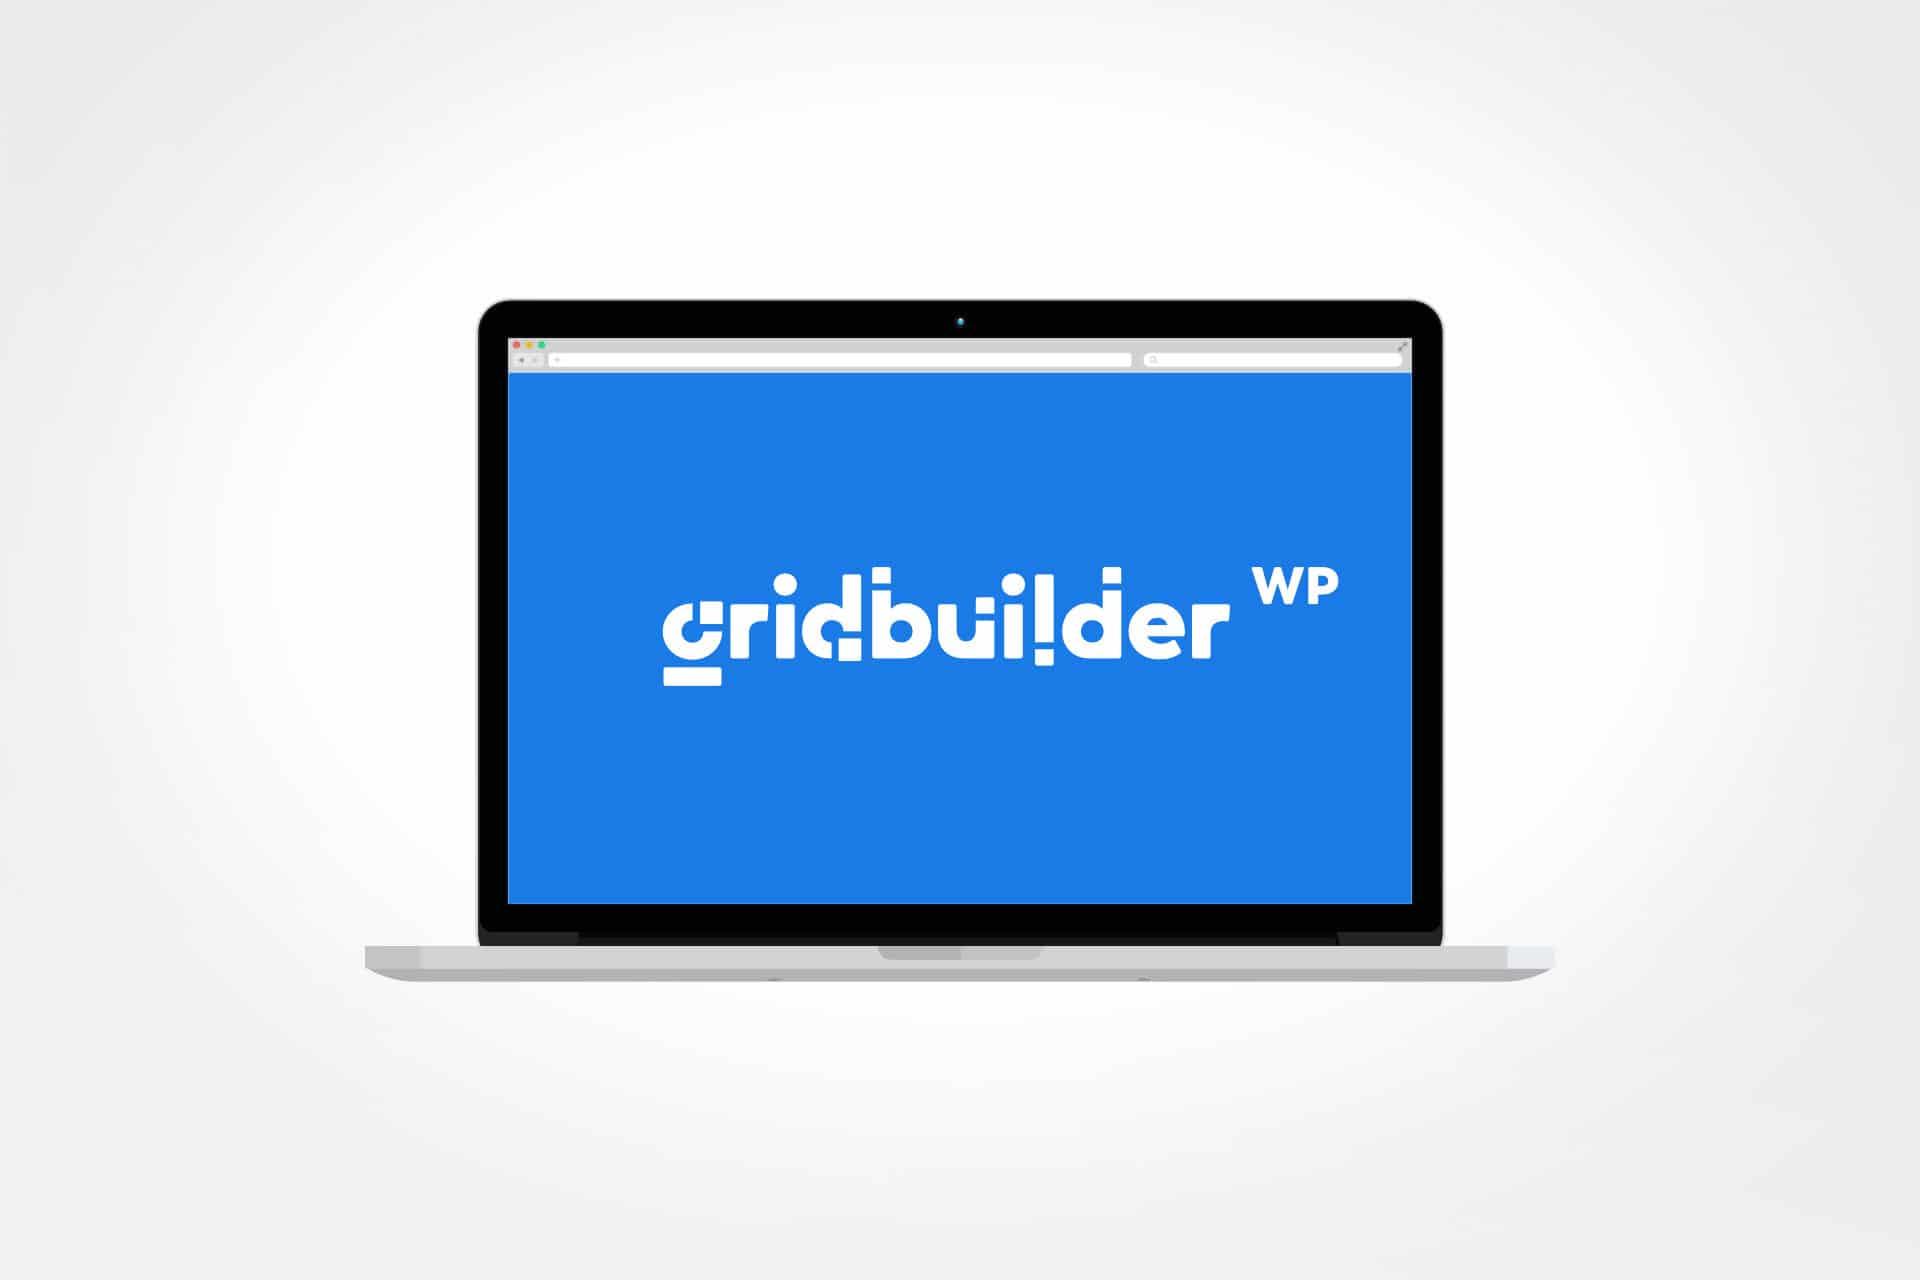 écran avec logo wpgridbuilder